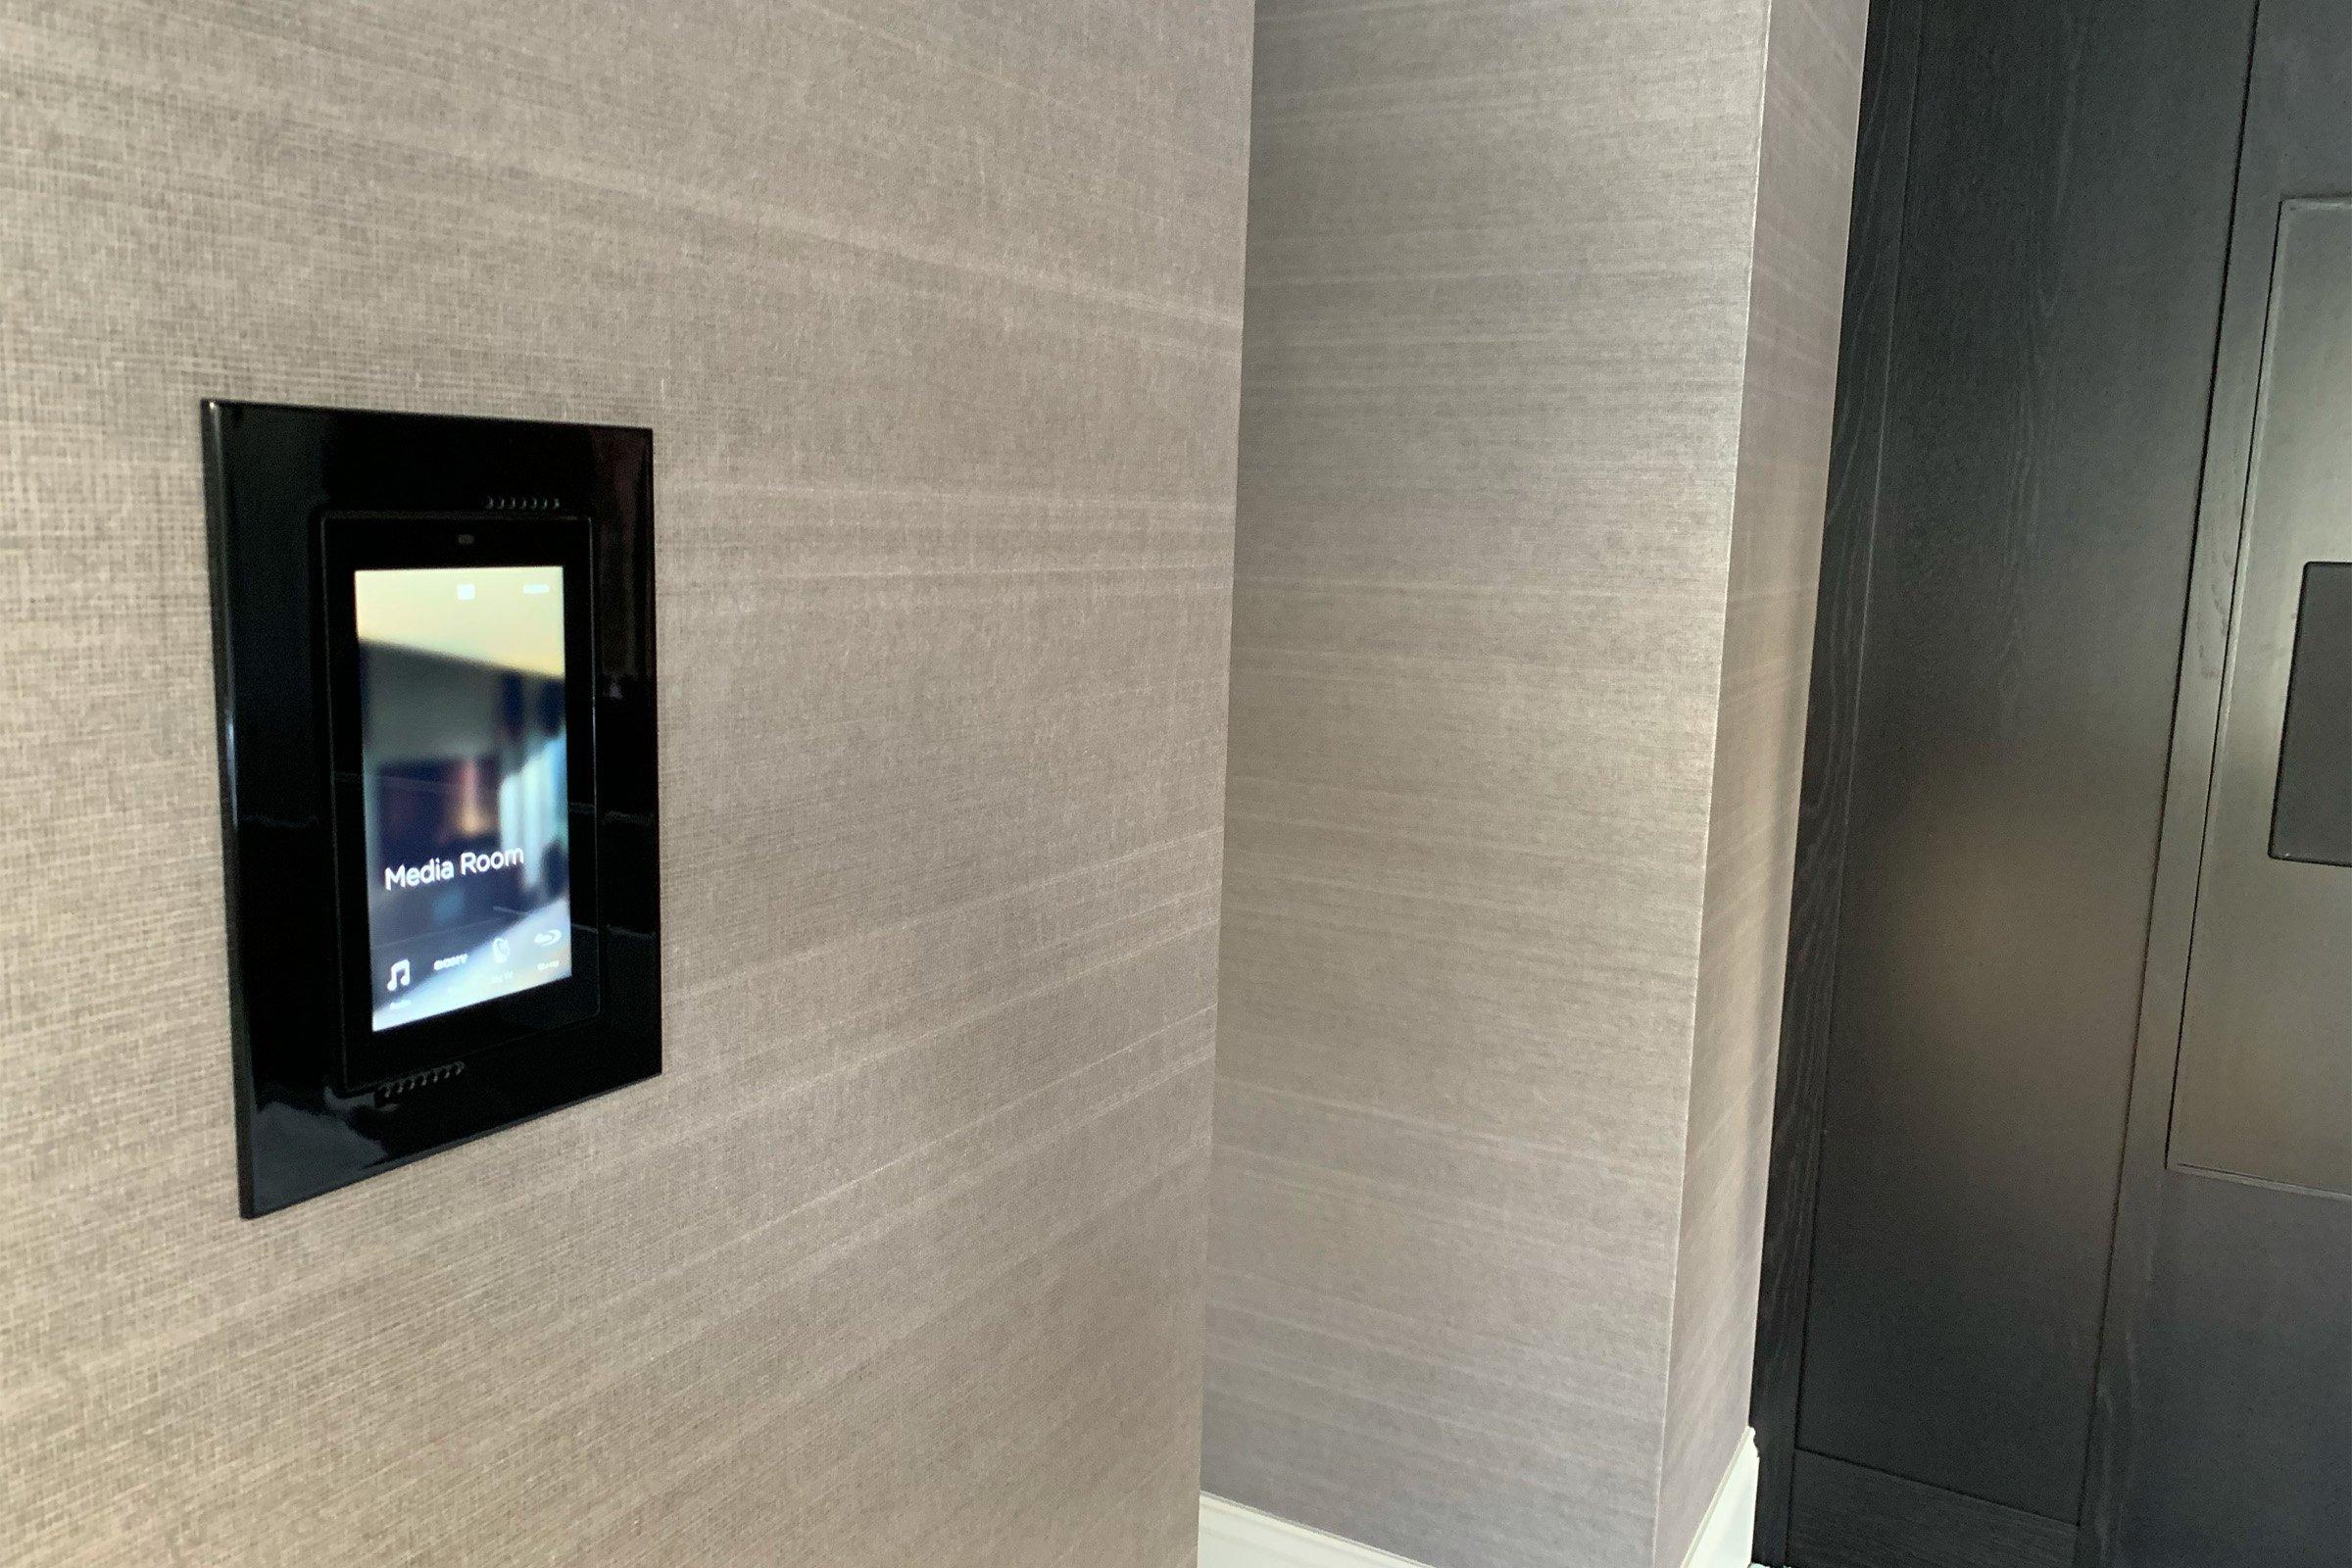 Savant in-wall touchscreen